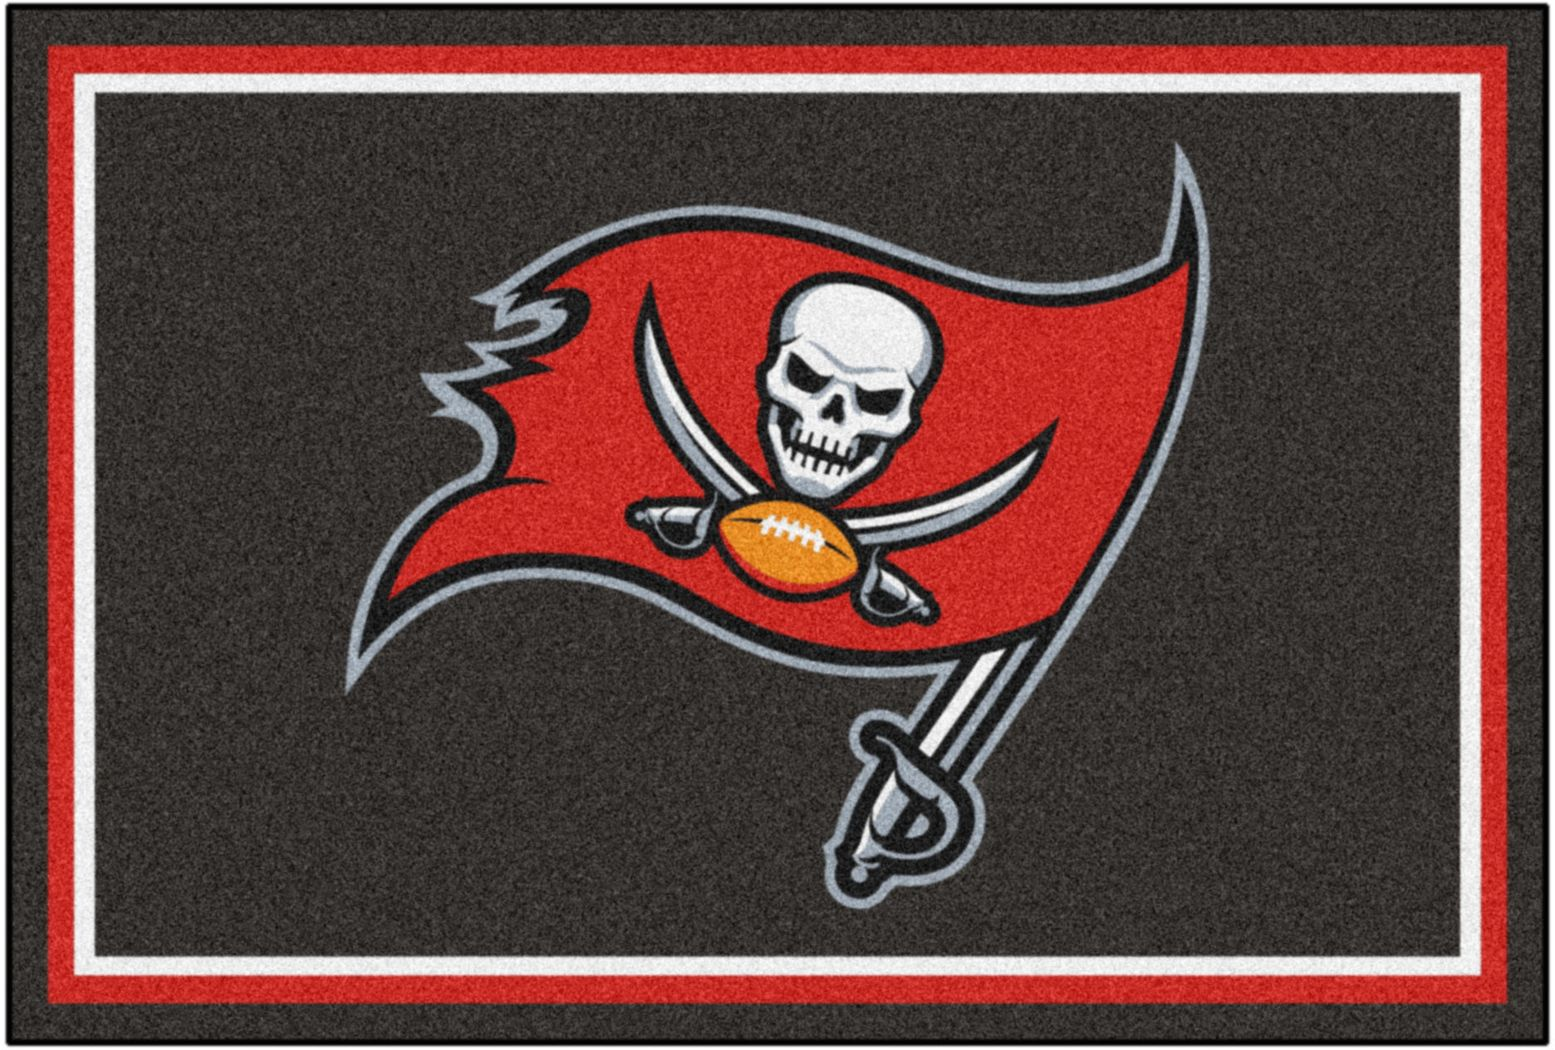 NFL Big Game Tampa Bay Buccaneers 5' x 8' Rug